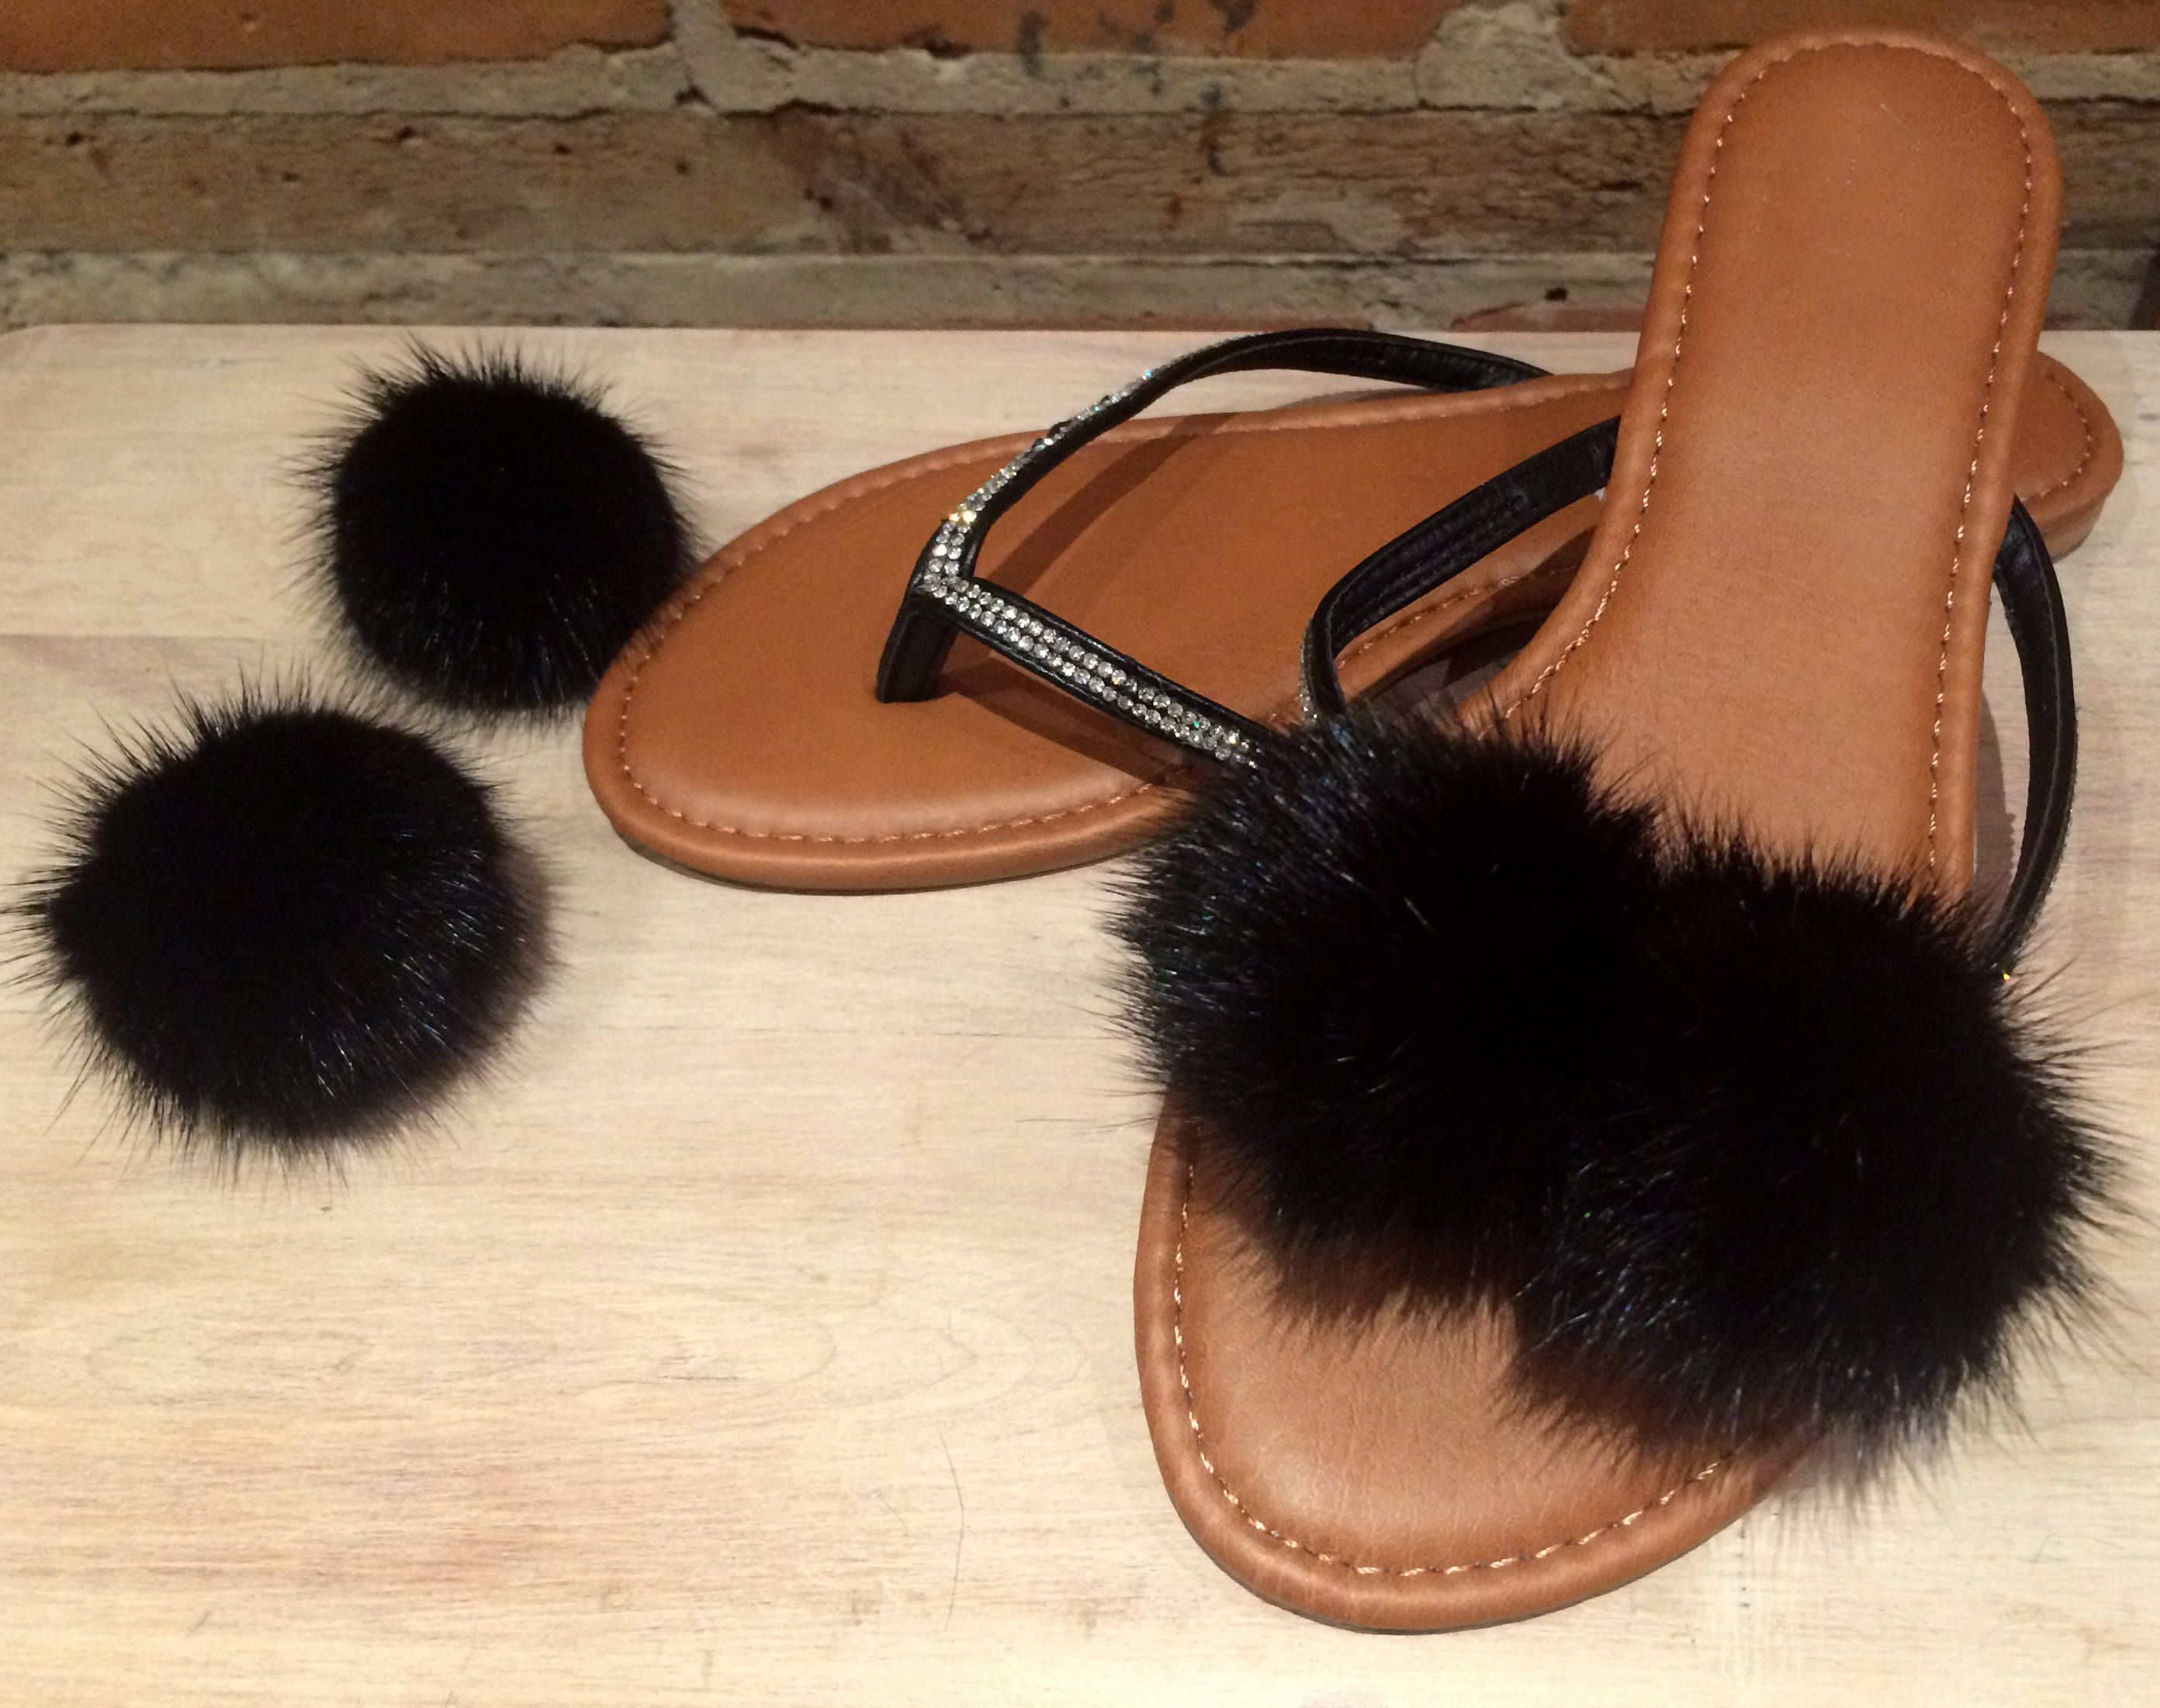 Black and Gray Clip for Shoes Rabbit Fur Shoe Clips 2 piece Shoe Accessories